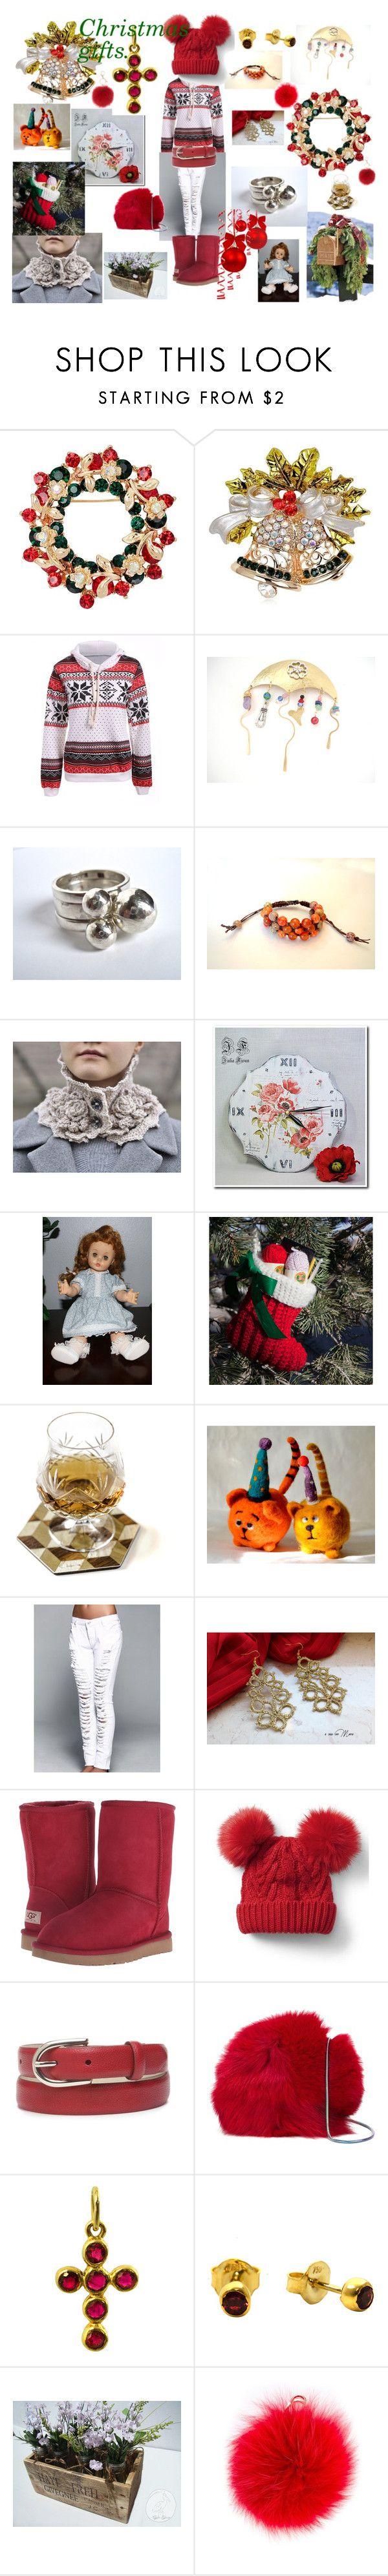 """Christmas gifts."" by stavrosdragatakis ❤ liked on Polyvore featuring Shamballa Jewels, UGG Australia, Gap, New Directions, Diane Von Furstenberg, Furla, L.K.Bennett and dragatakisjewellery"